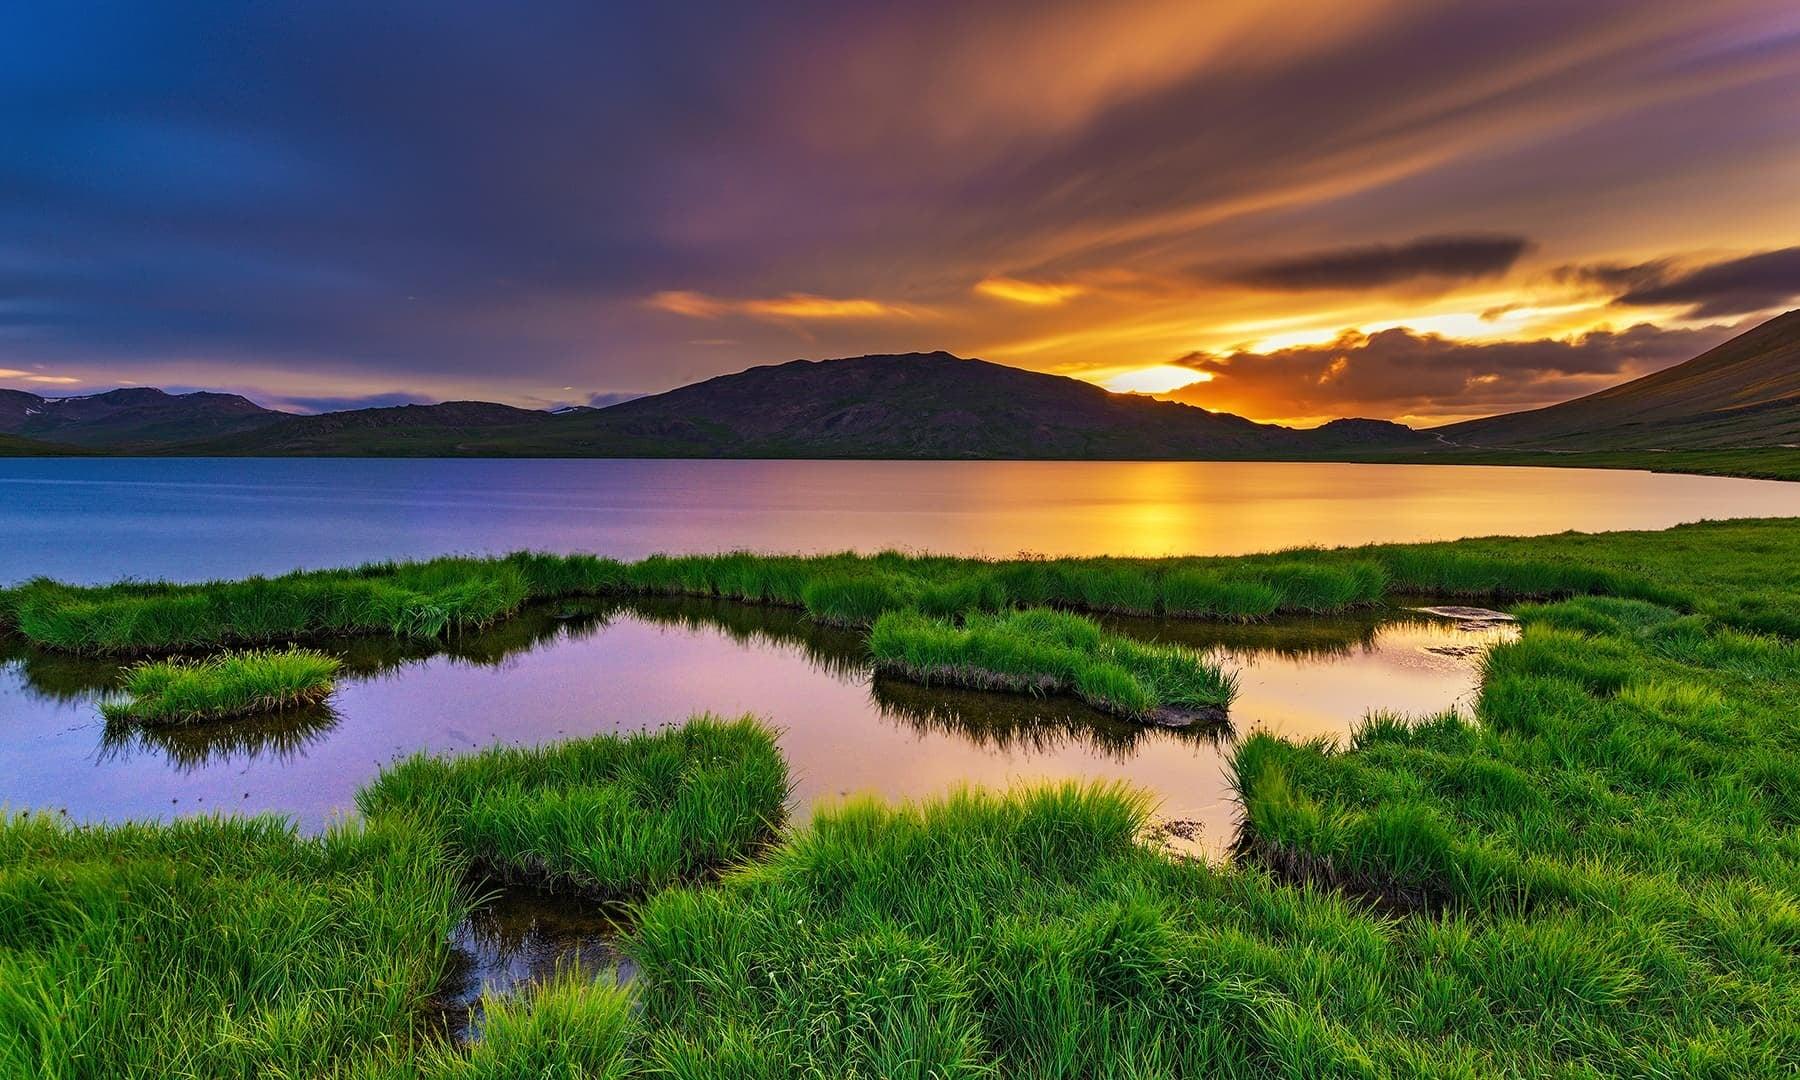 The last rays of the sun at Sheosar Lake. — Photo by Syed Mehdi Bukhari